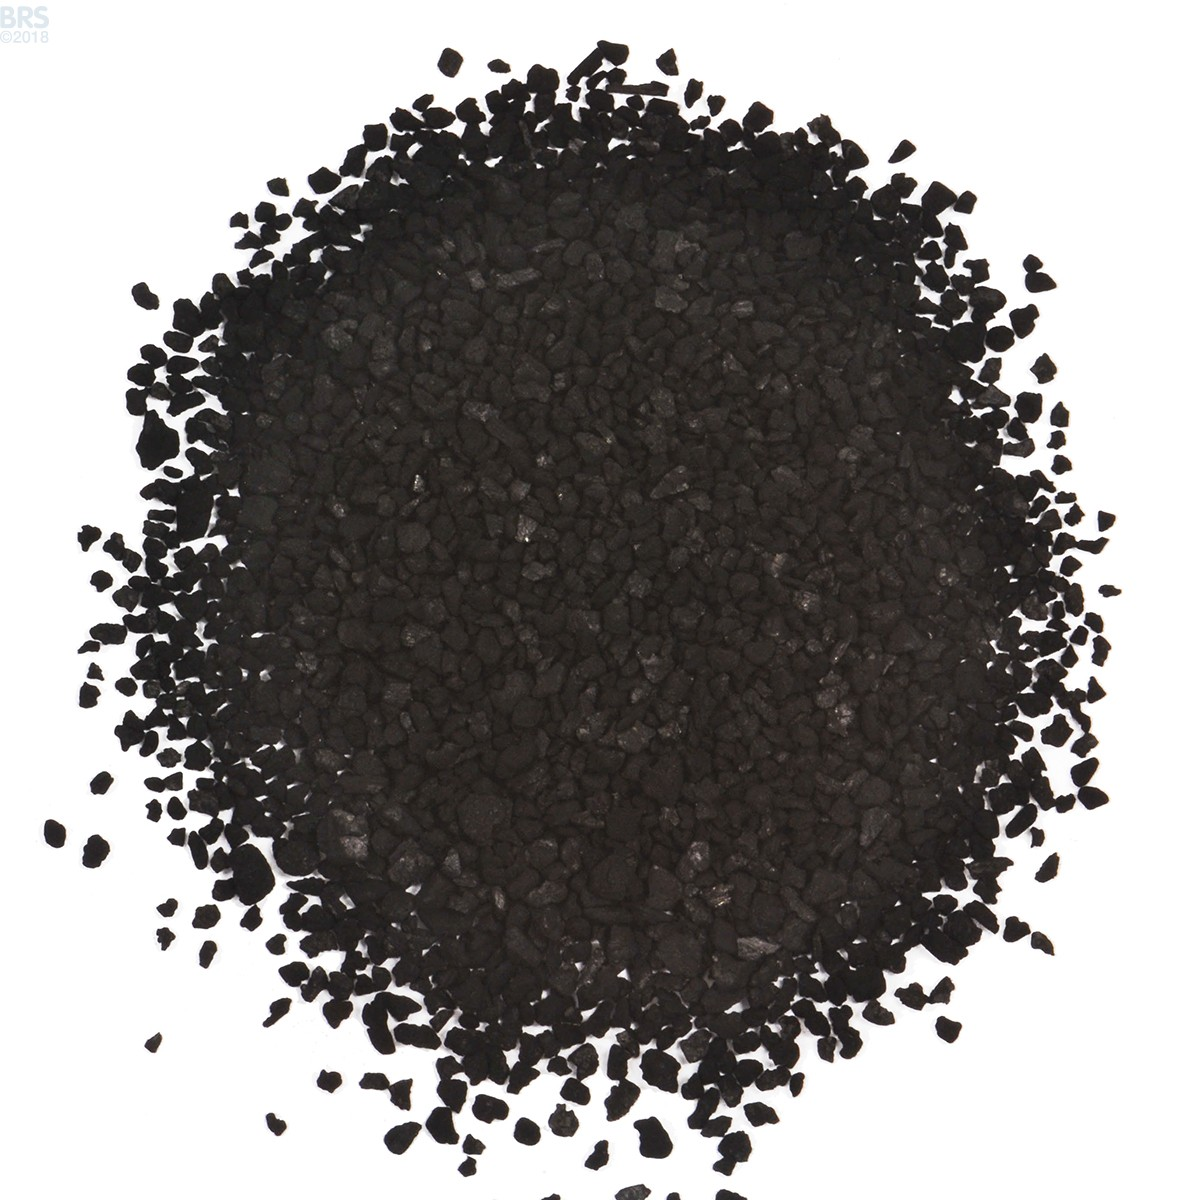 Brs Bulk Small Particle Lignite Aquarium Carbon Bulk